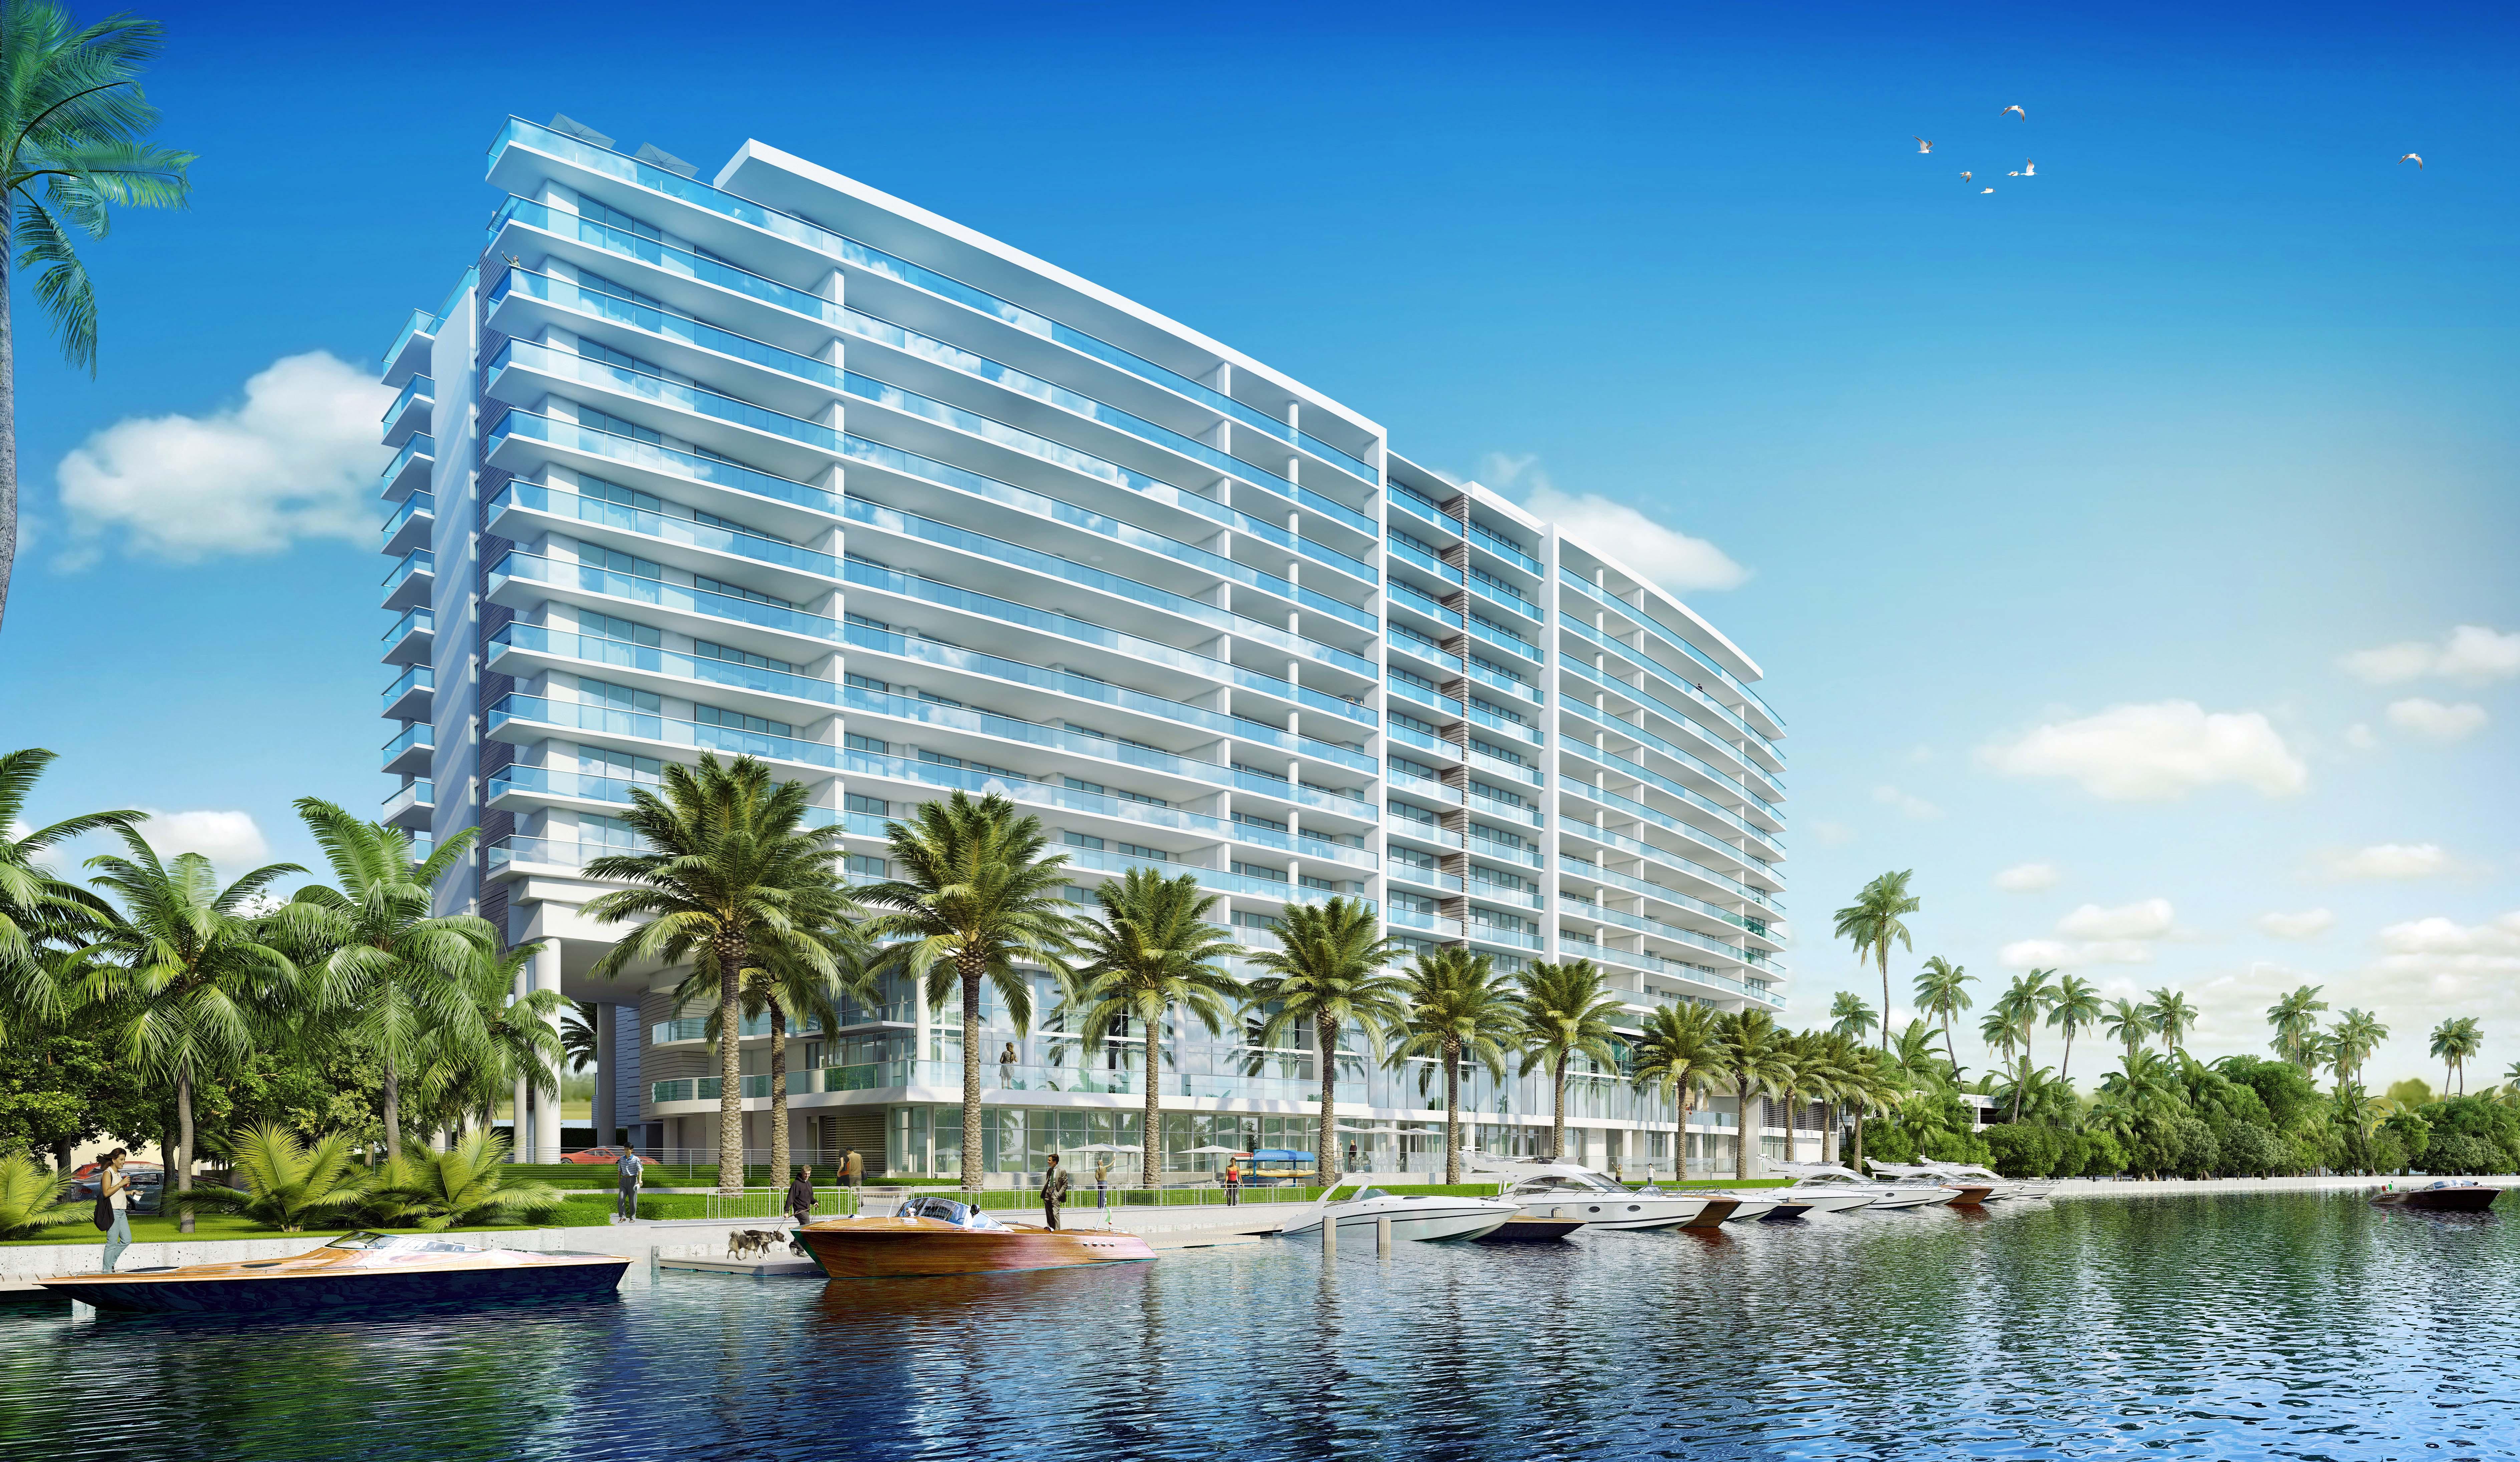 Apartamento para Venda às 1180 N Federal Hwy #703 1180 N Federal Hwy 703 Fort Lauderdale, Florida, 33304 Estados Unidos